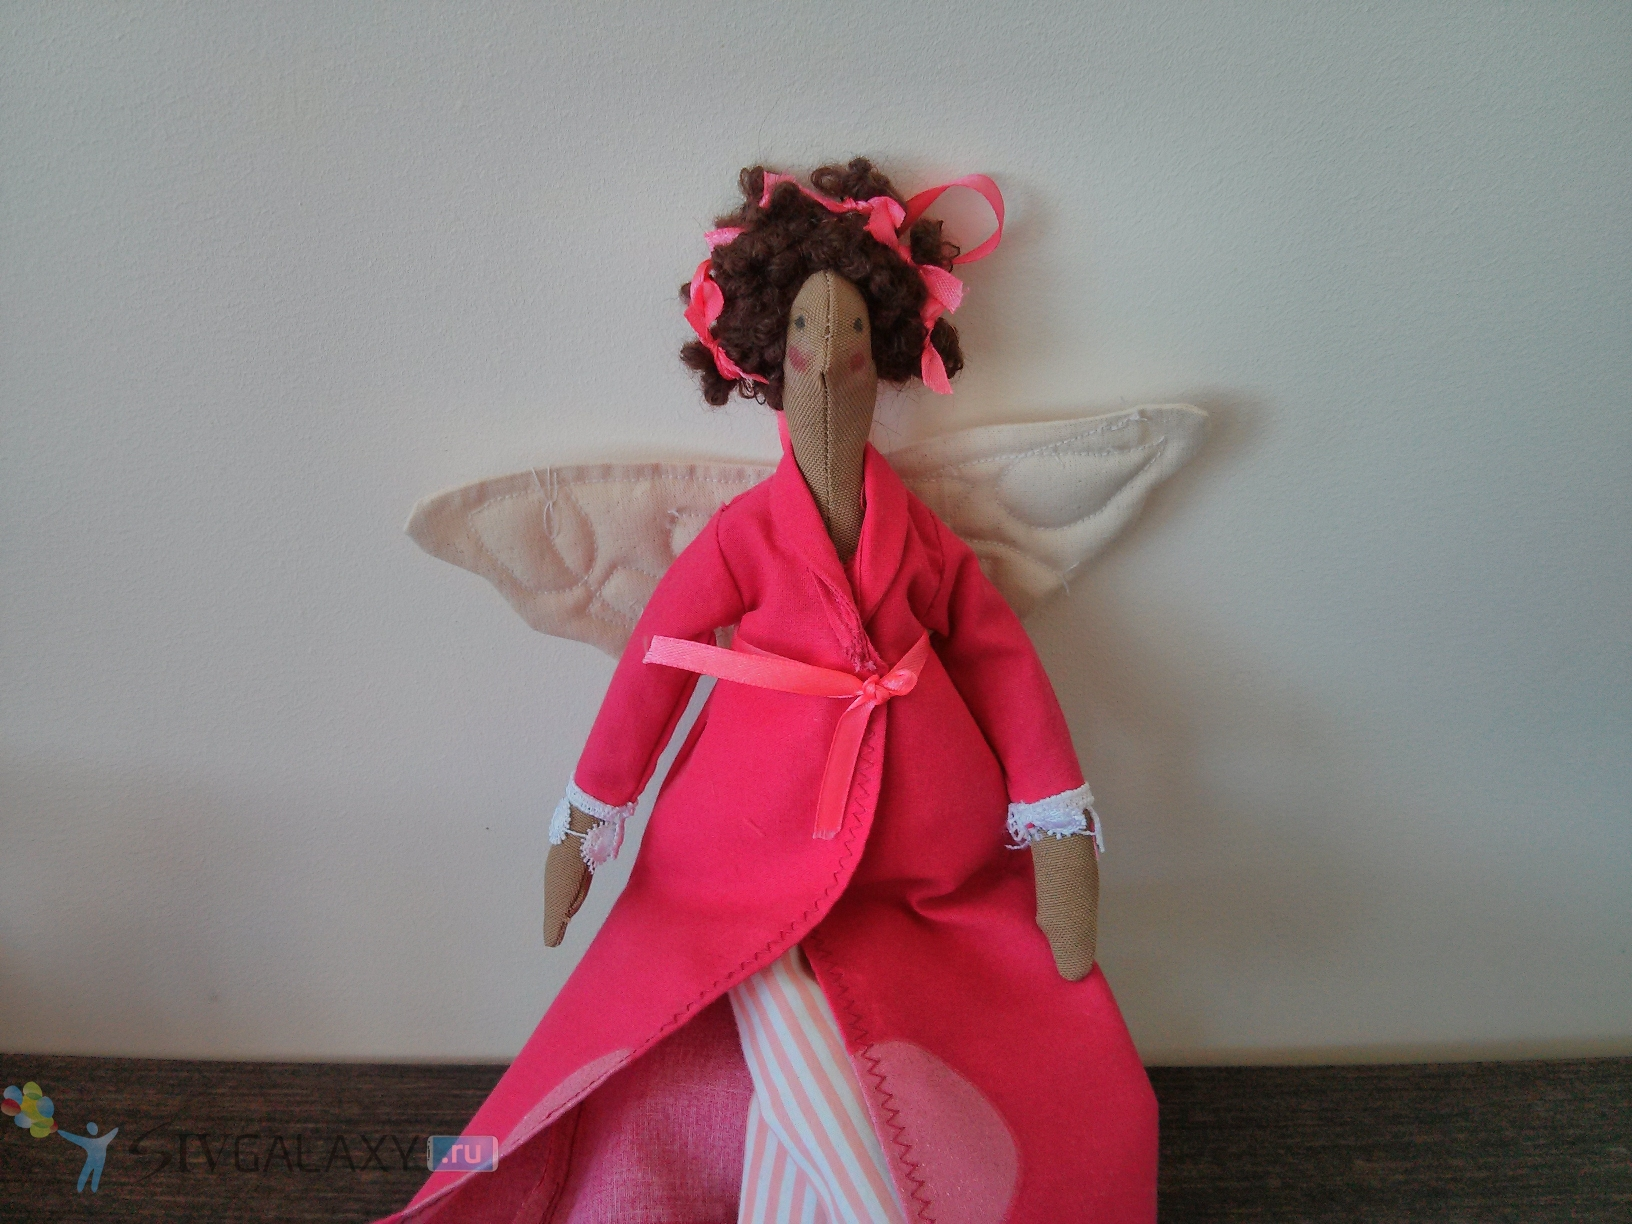 Фото с камеры LG Nexus 4 - кукла-ангел